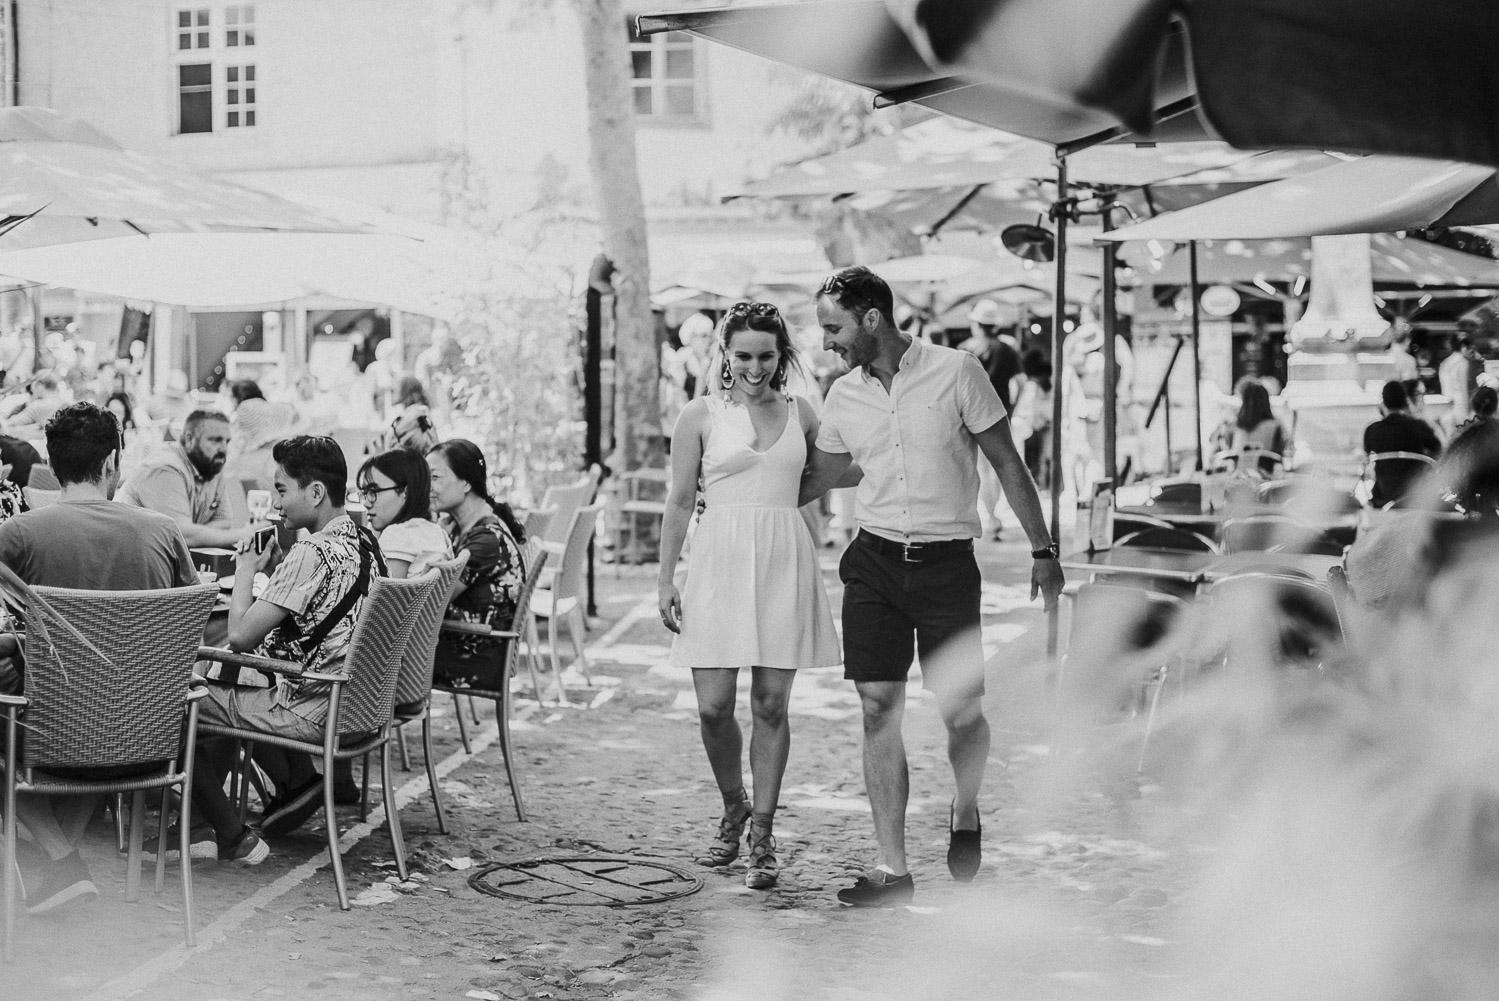 carcassonne_south_west_france_wedding_engagement_tarn_katy_webb_photography18